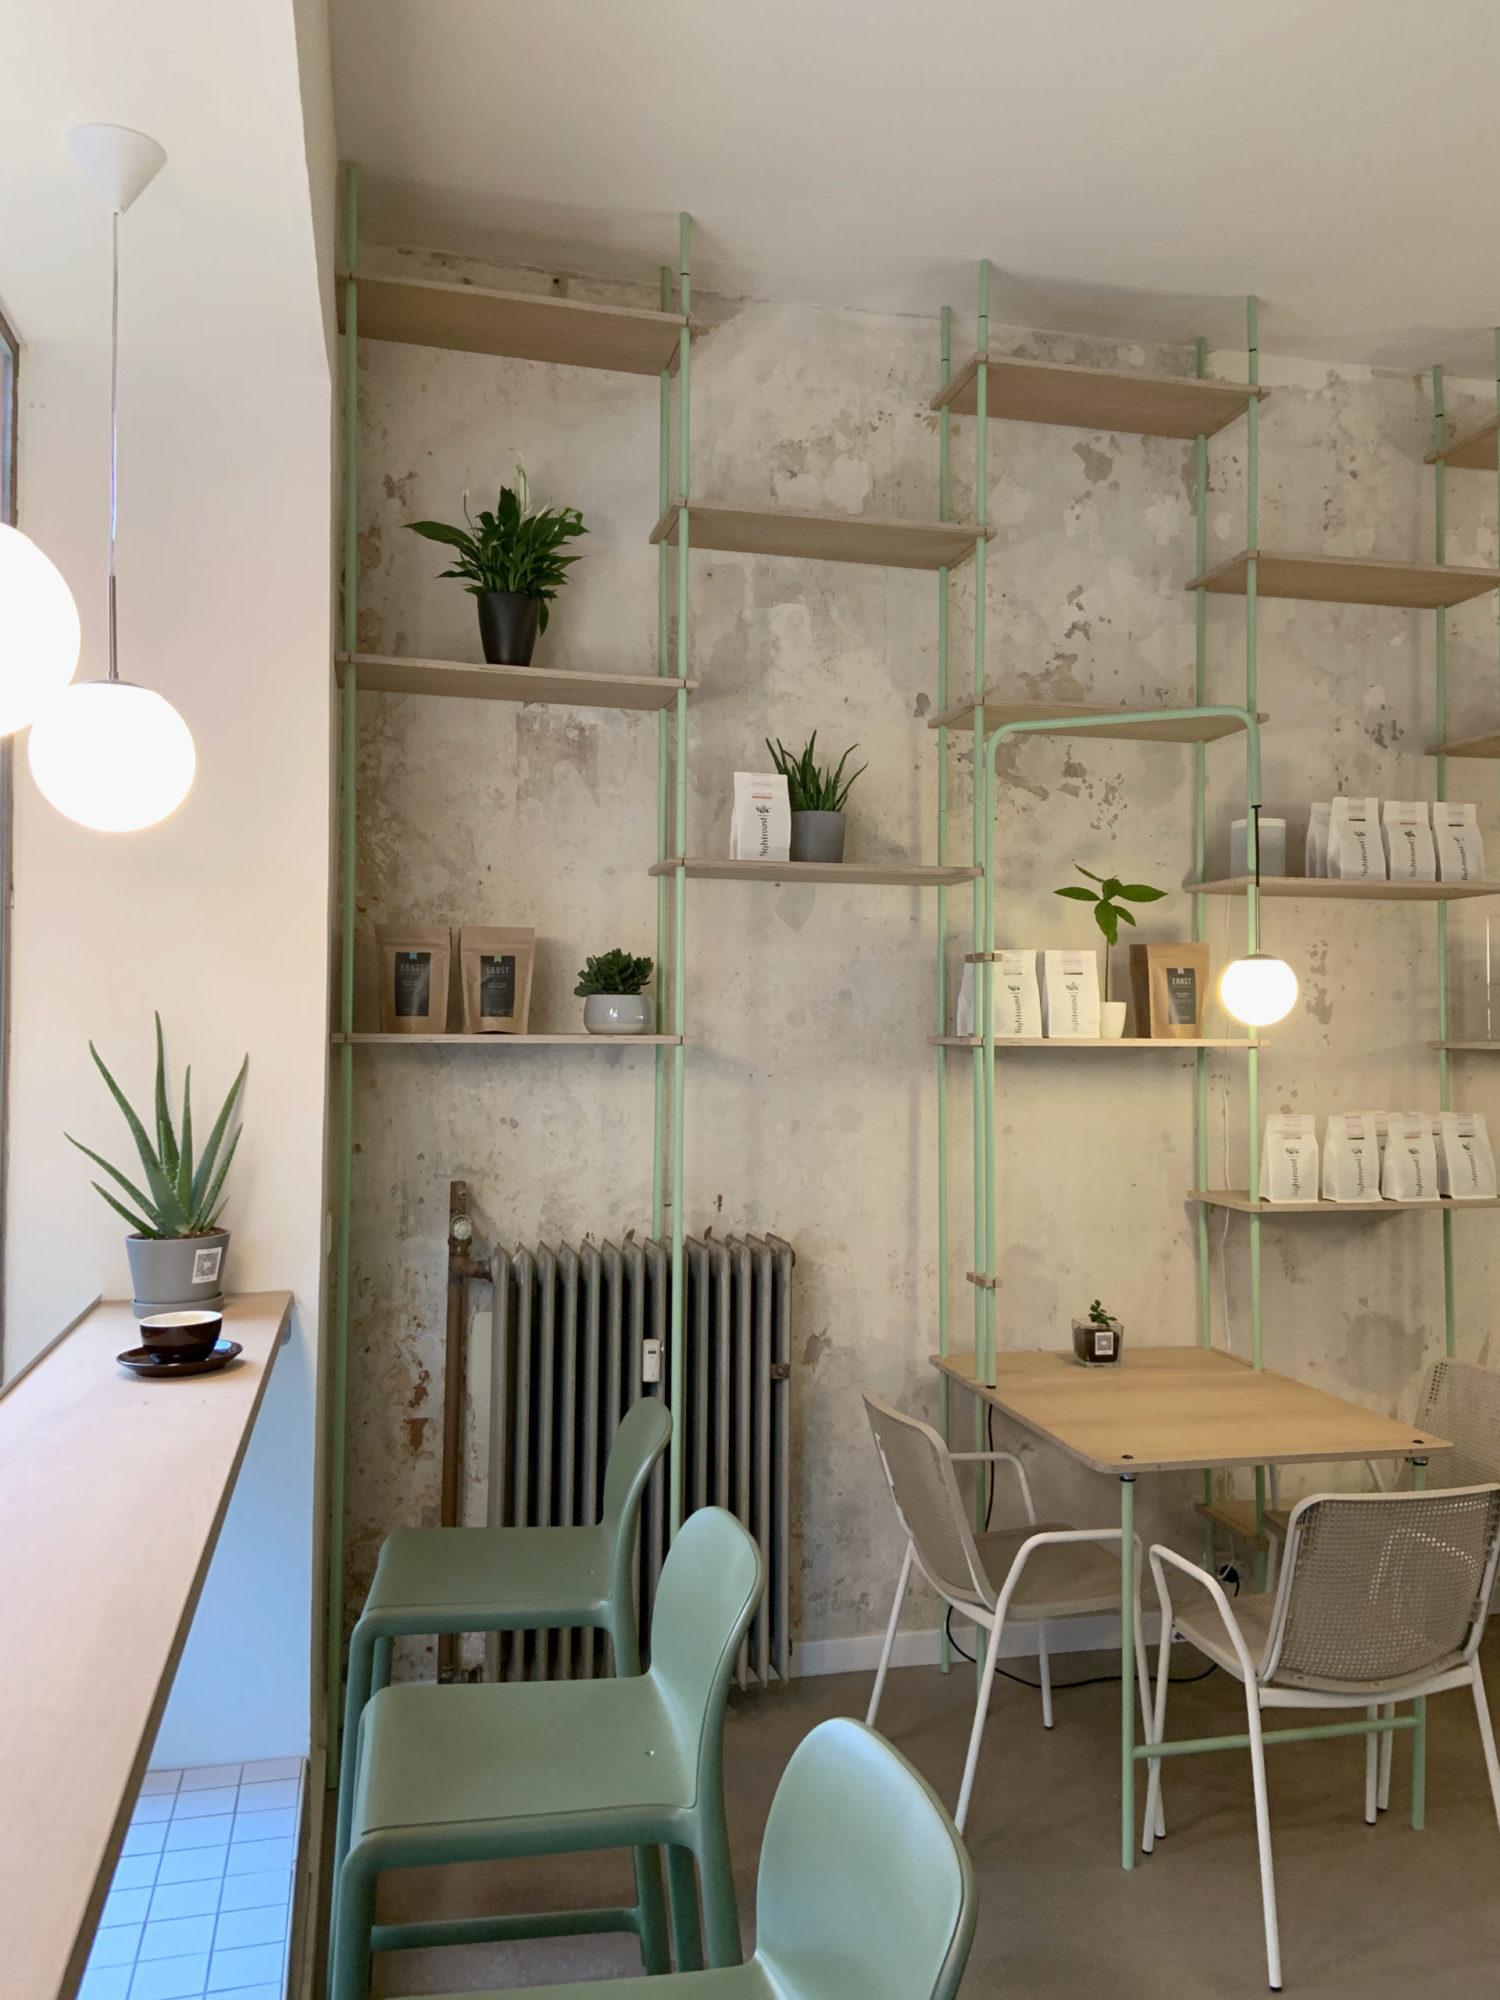 Cafe_Stoak_Duesseldorf_Konture_ThirdWaveCoffee